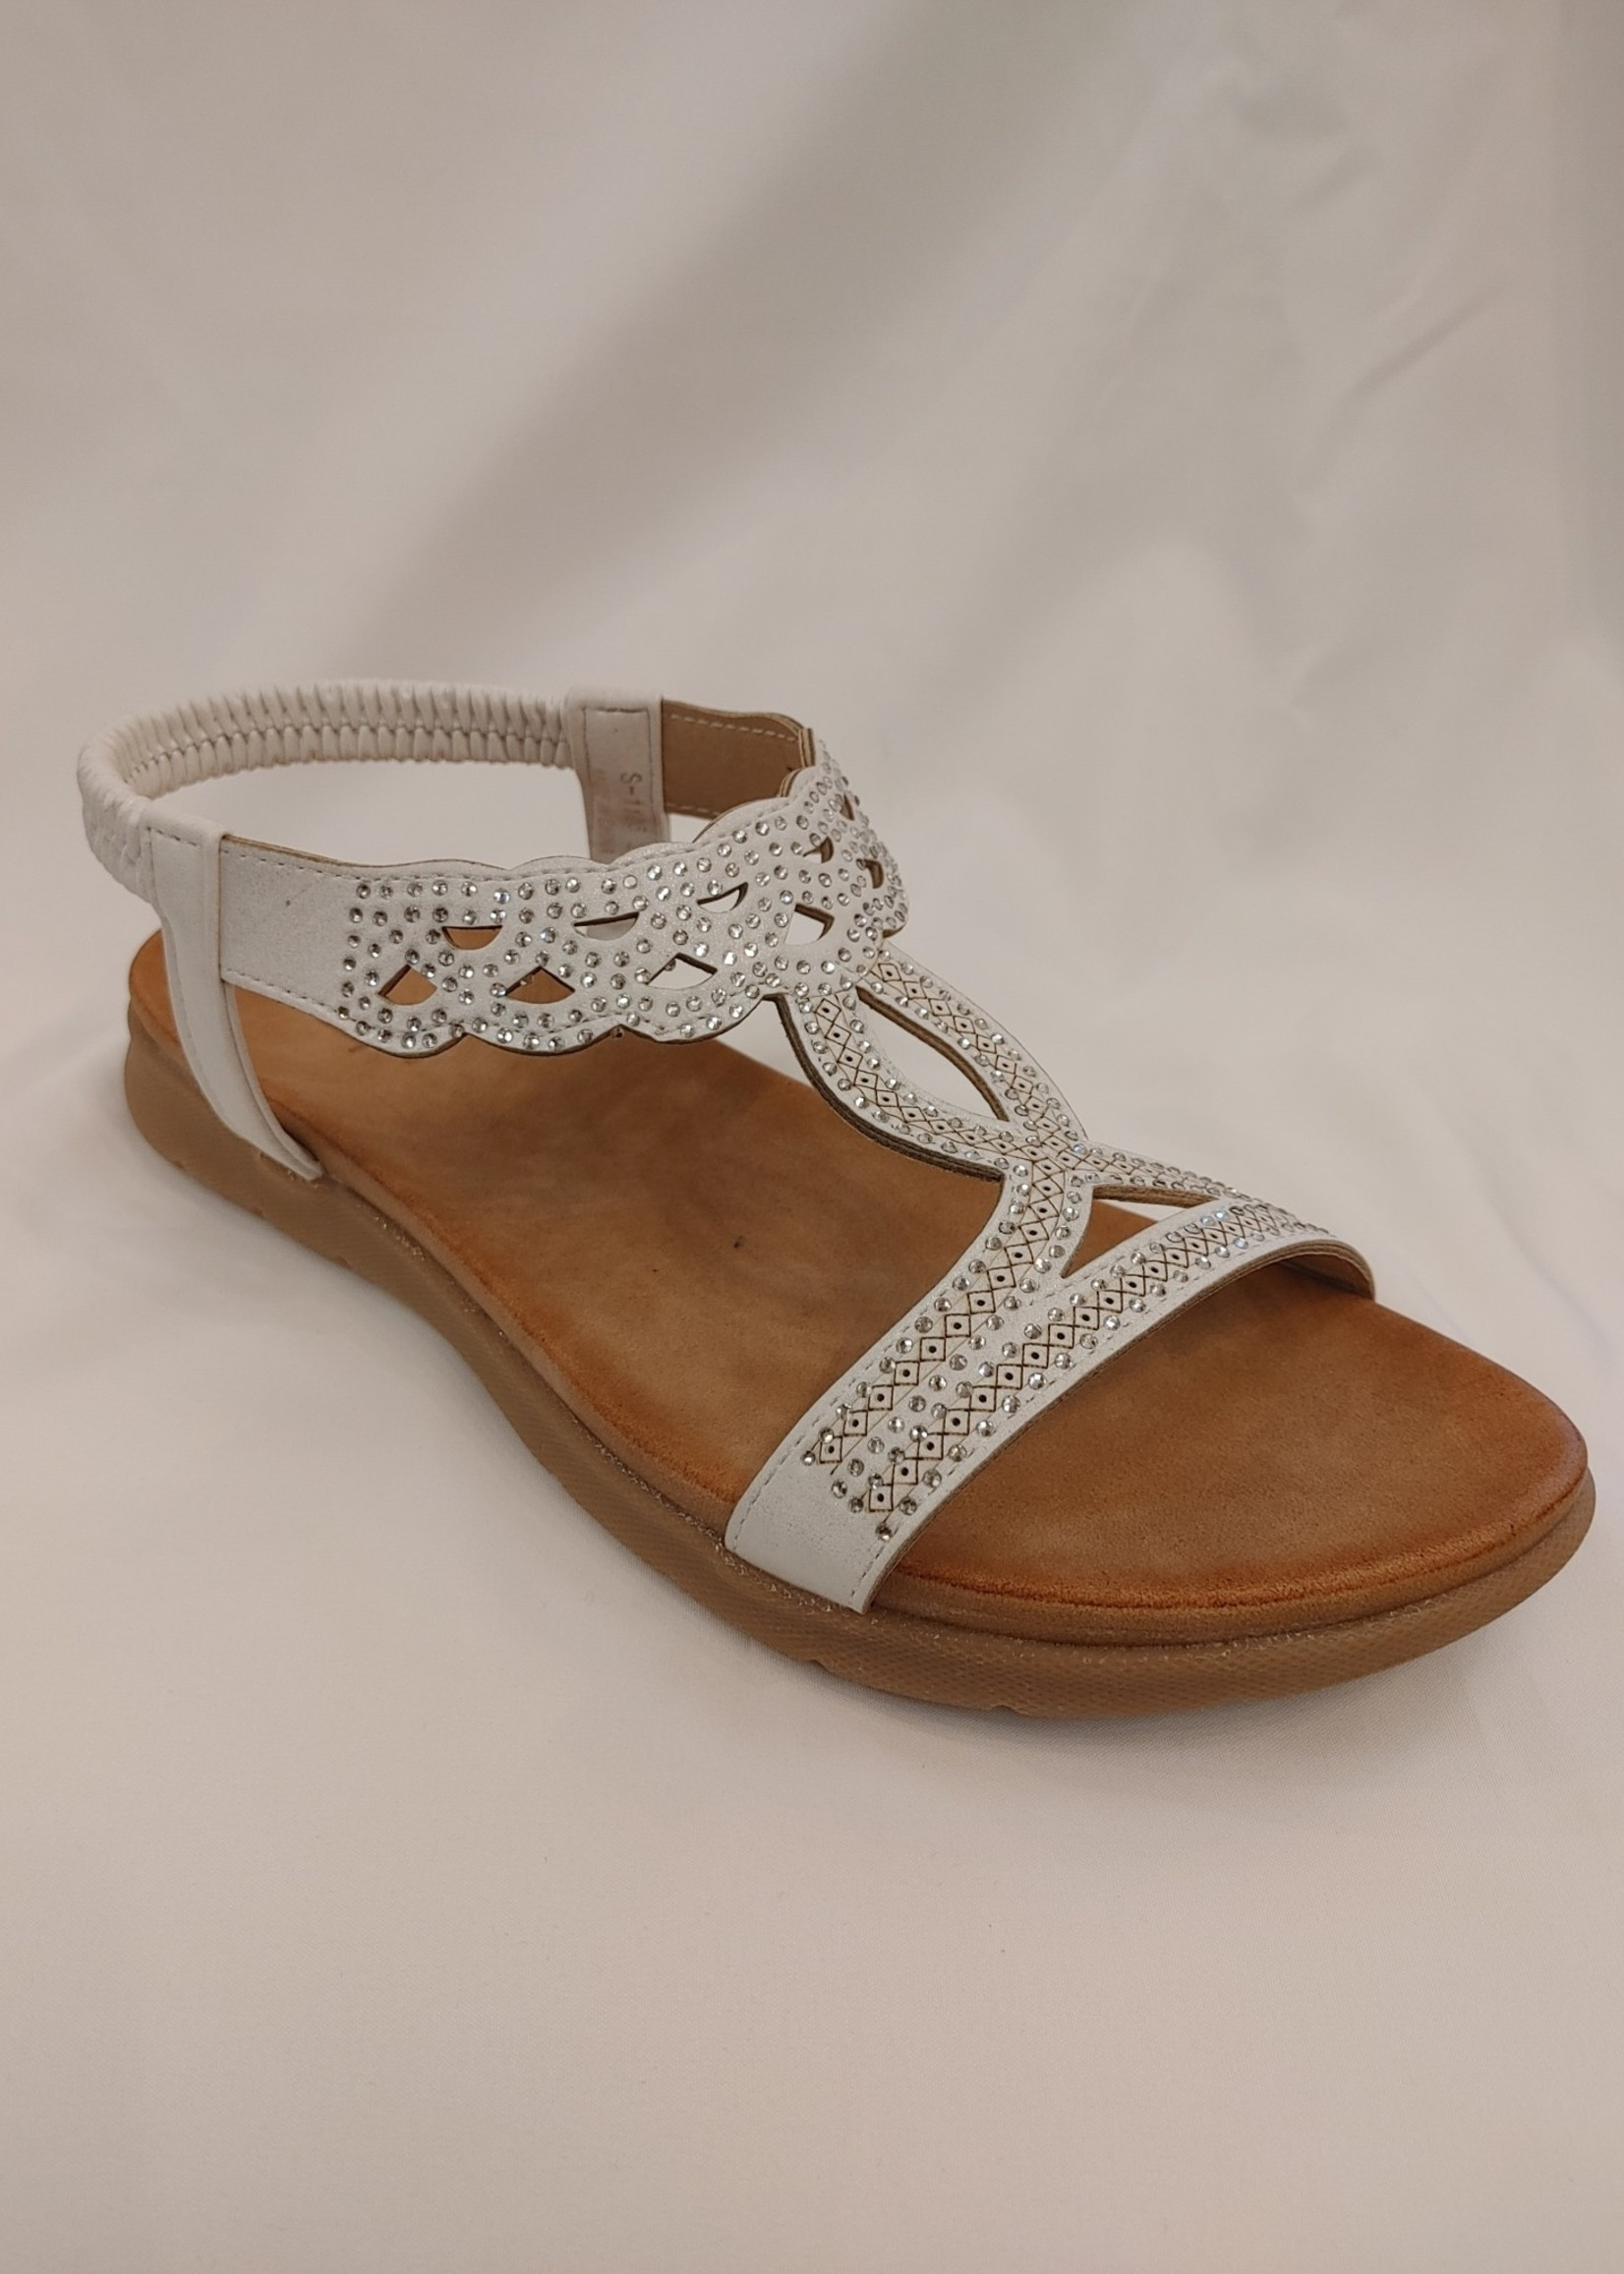 JJ Ladies sandals